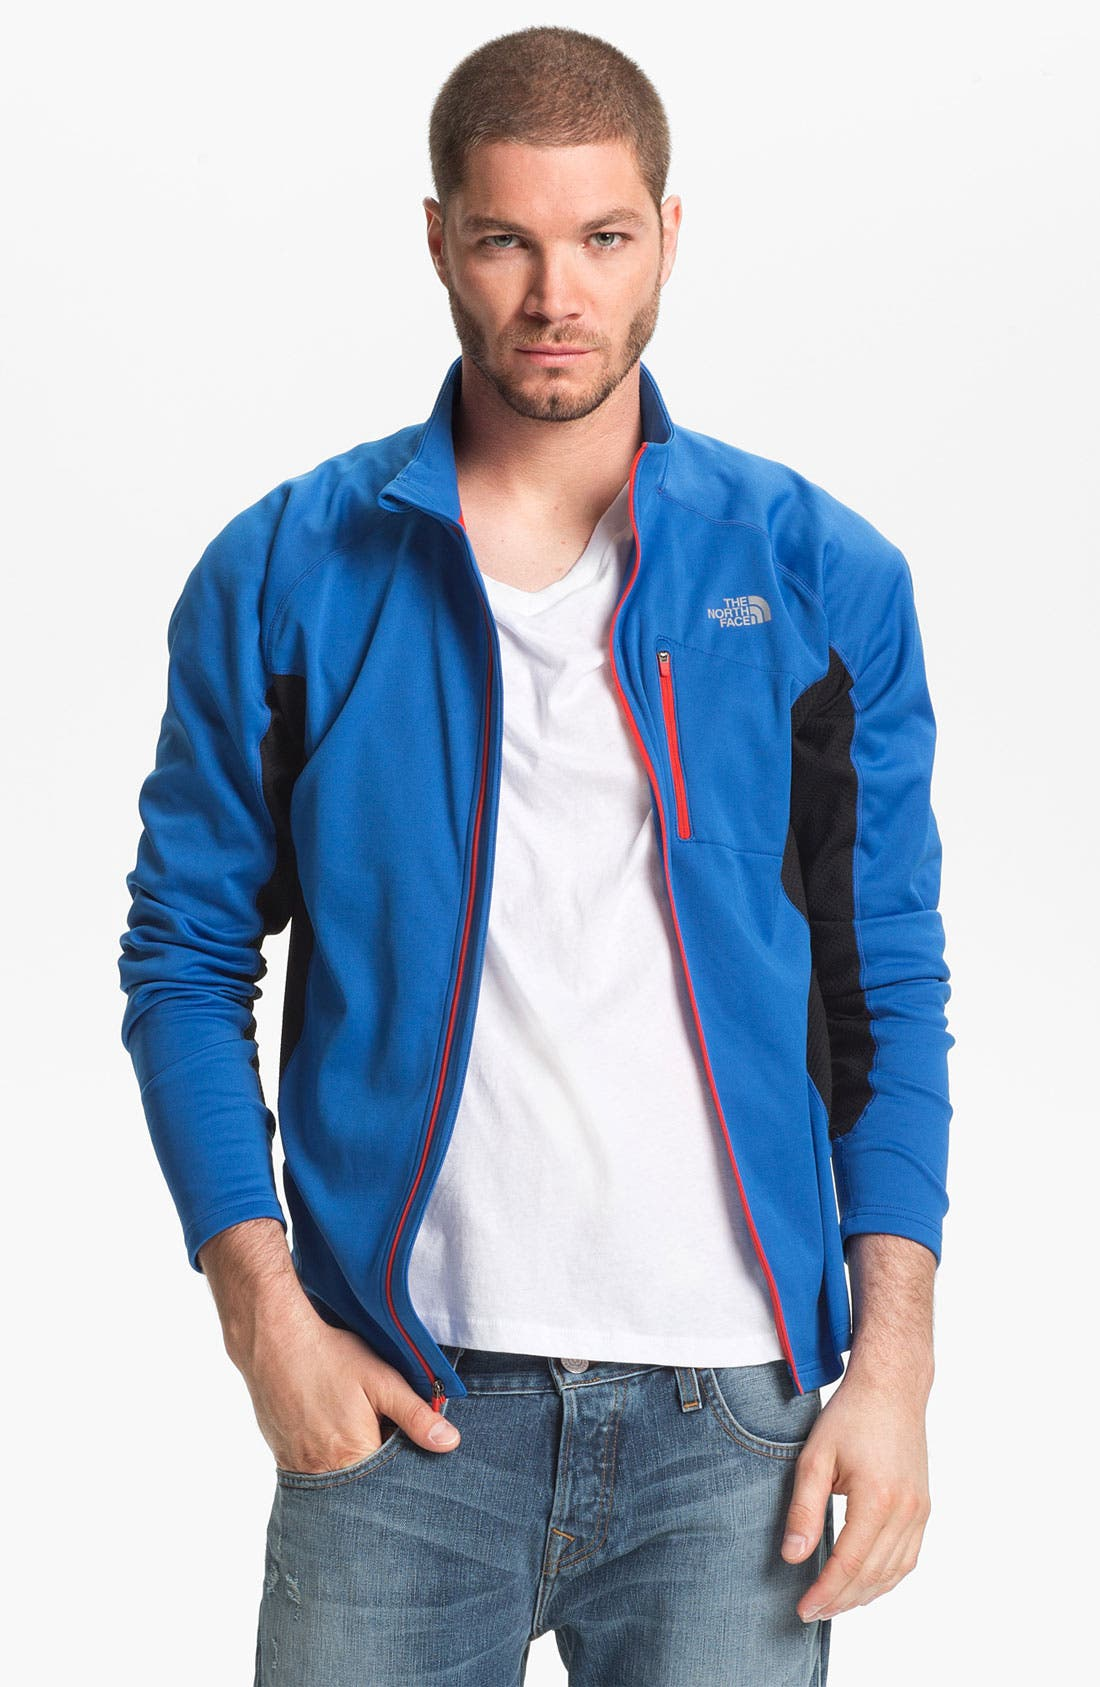 Main Image - The North Face 'Teocalli' Hybrid Fleece Jacket